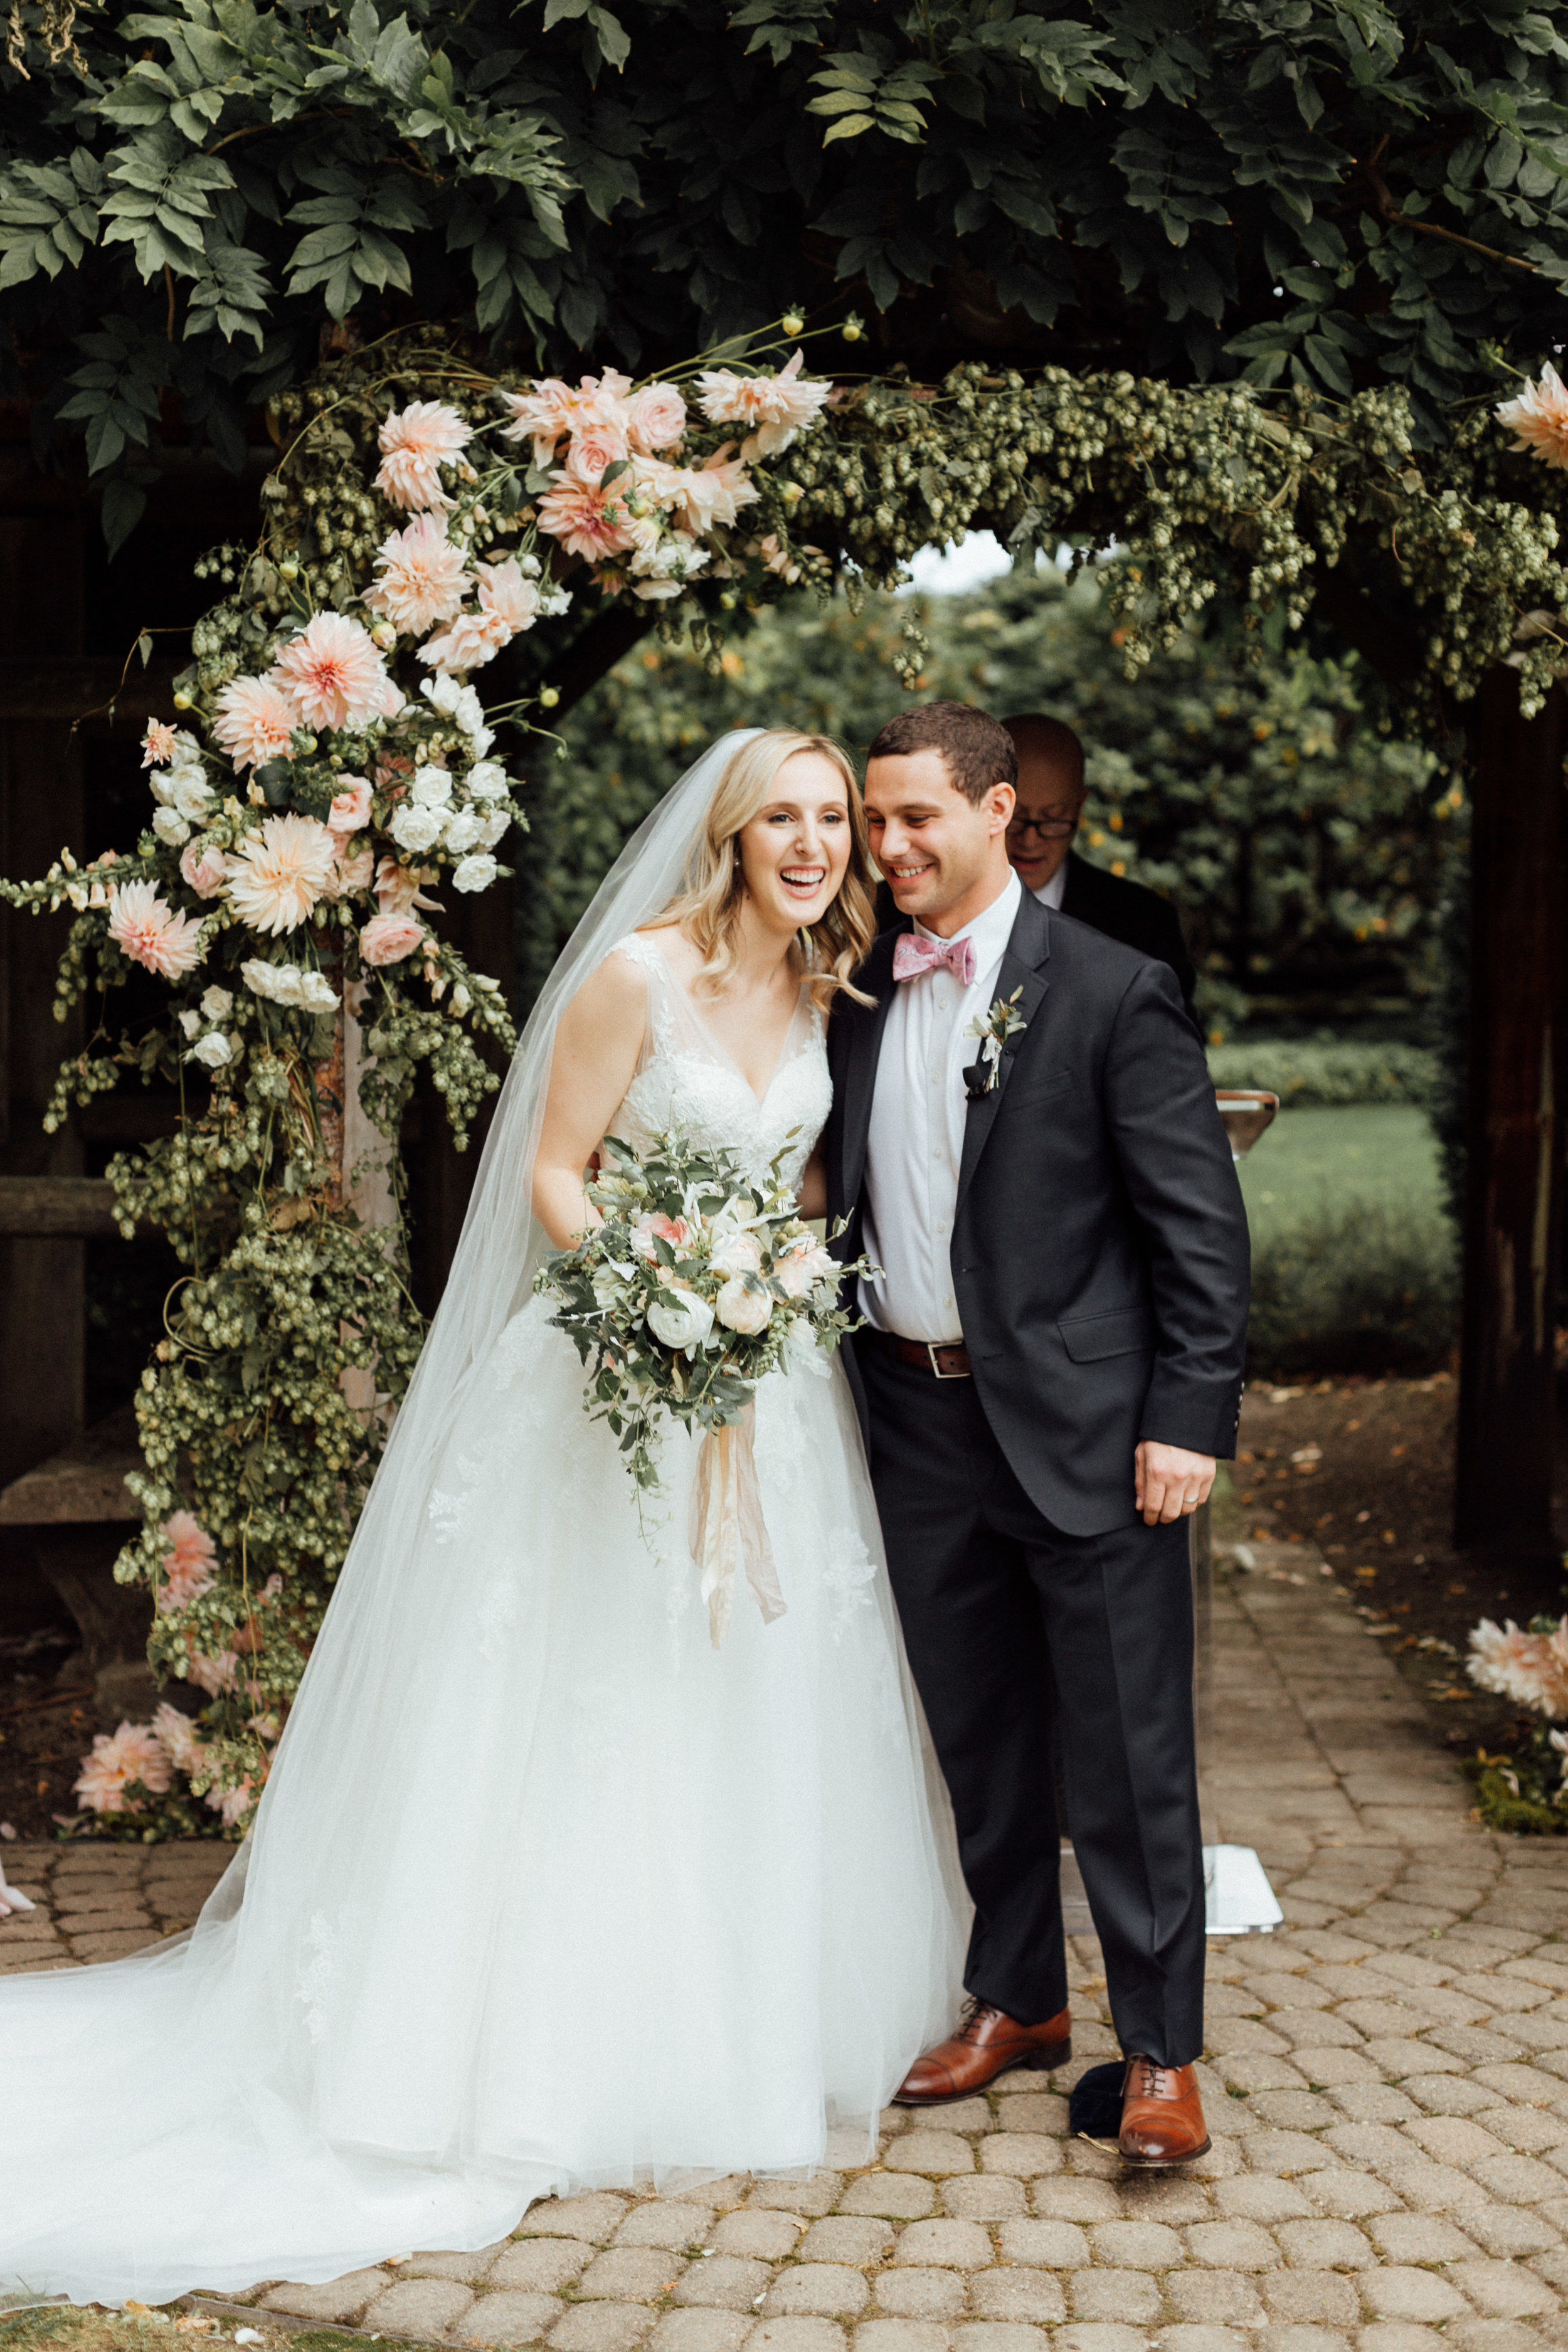 ANNIKA & ALEX - WEDDING